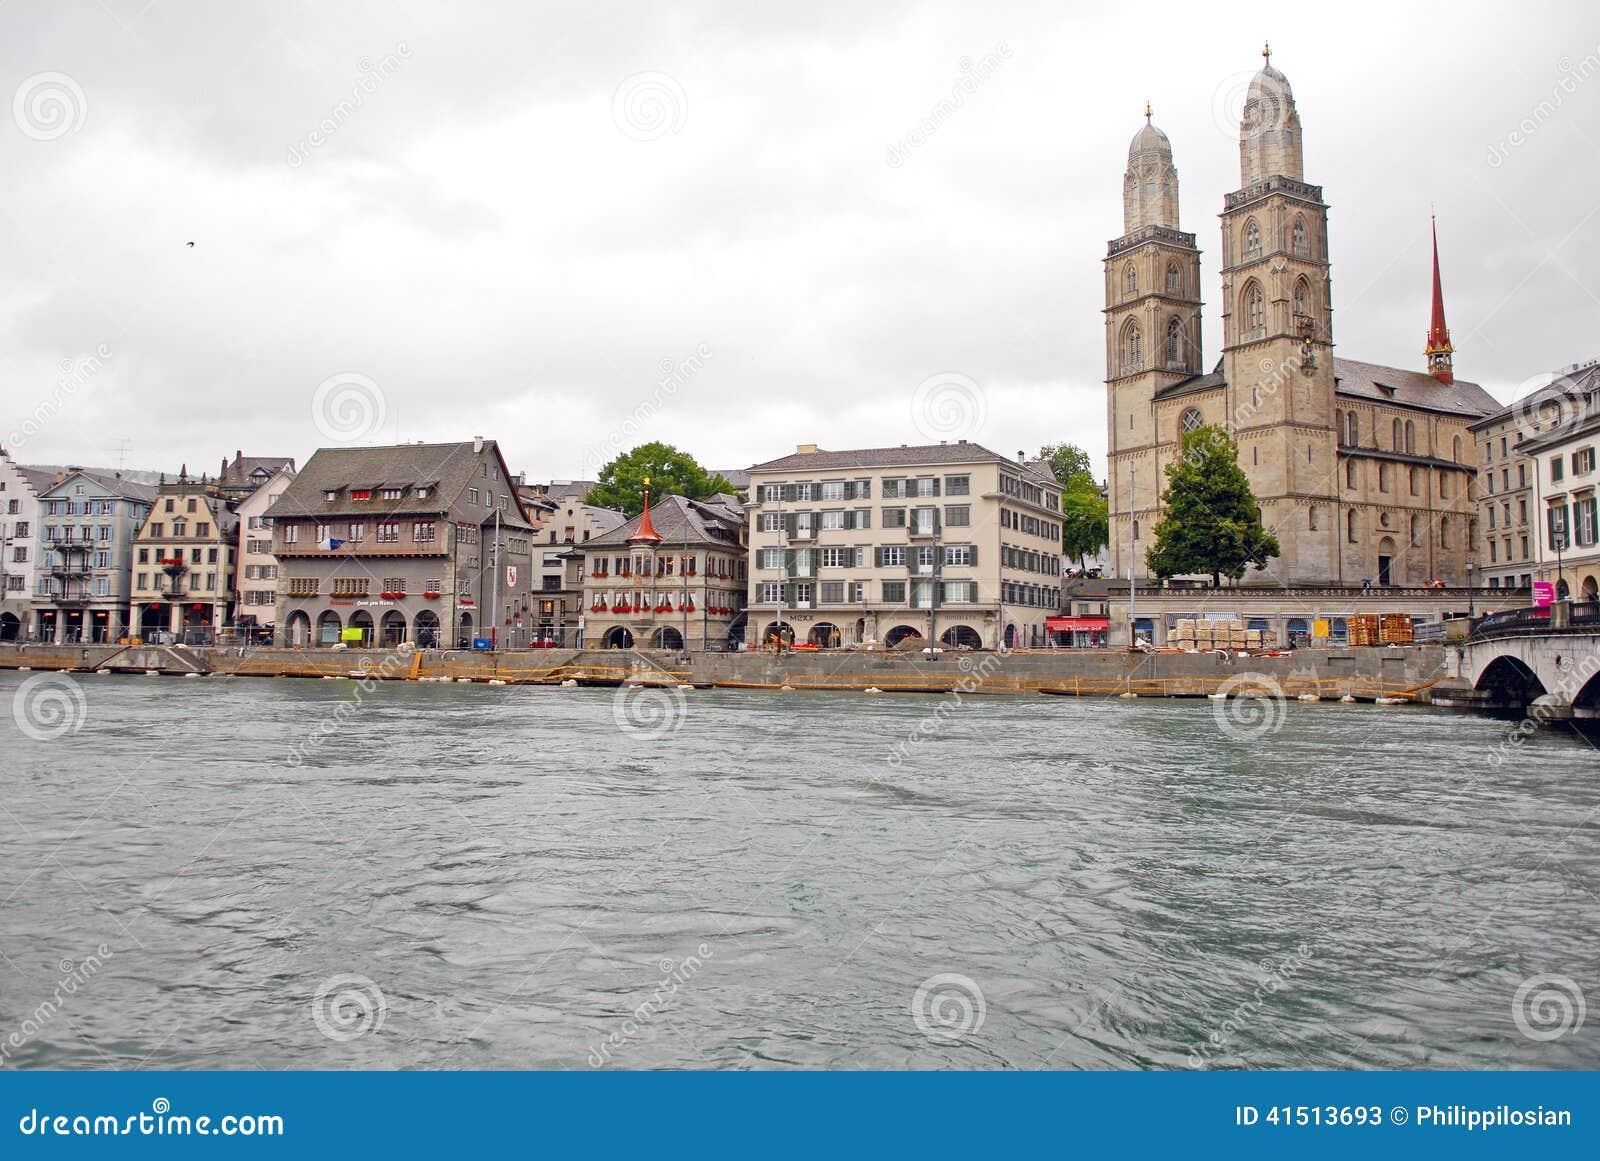 Cityscape Mening van Grossmunster-Kerk in Zürich, Zwitserland